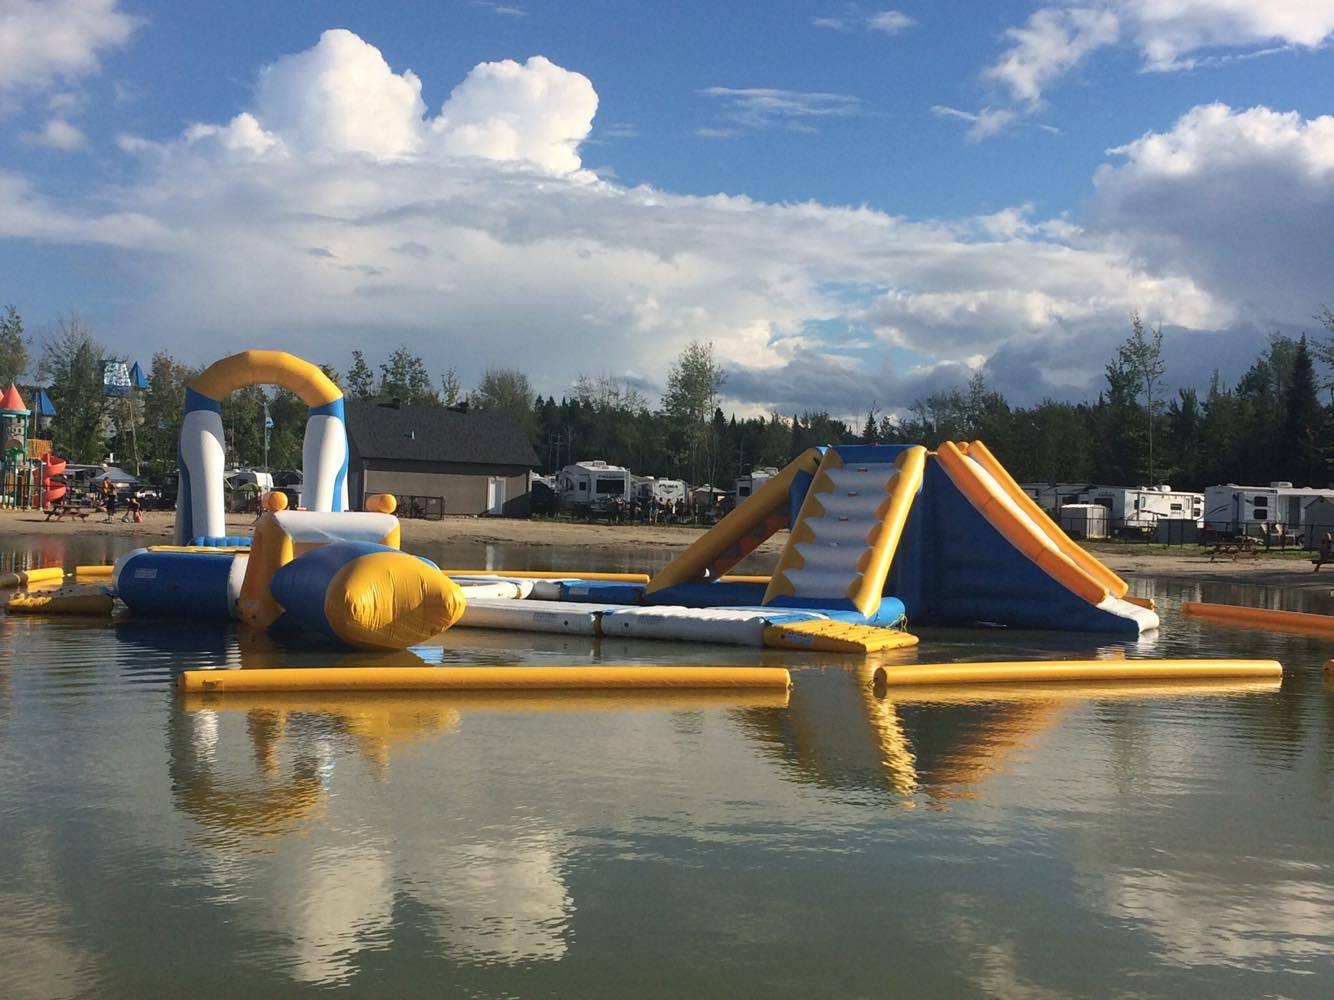 http://www.campingatlantide.com/wp-content/uploads/2017/07/parcours-gonflable-lac-complexe-atlantide-4.jpg